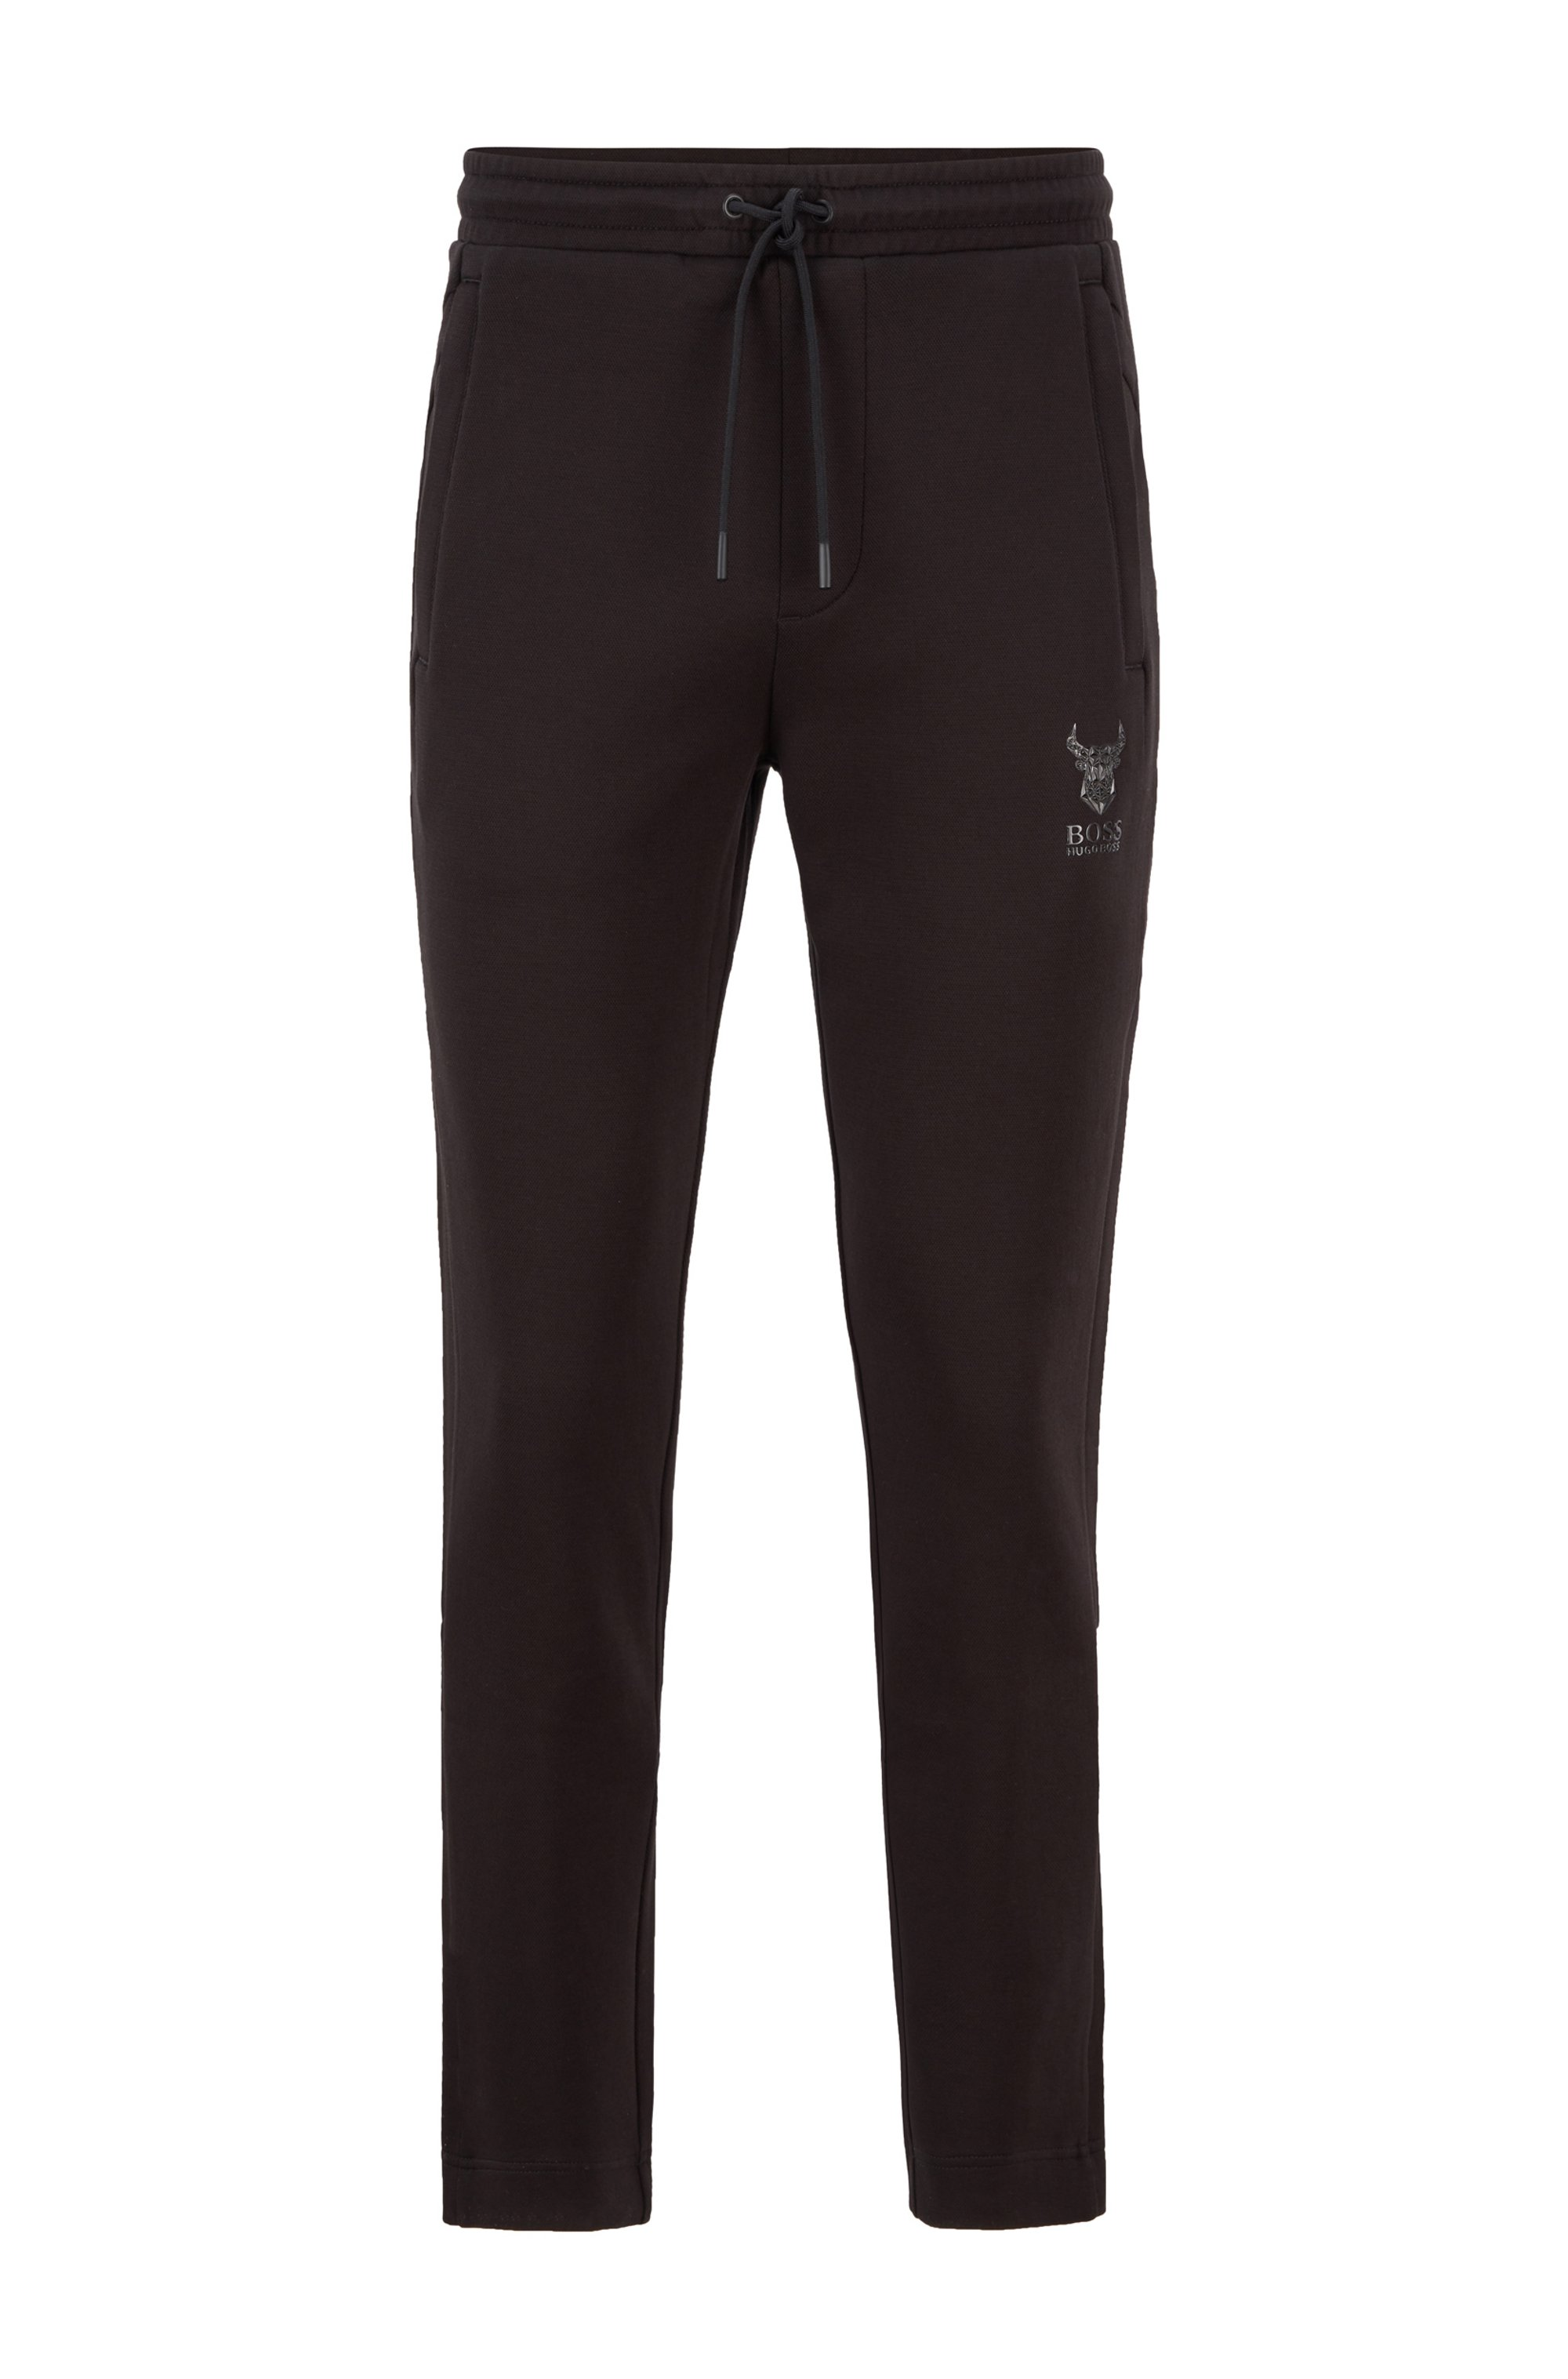 Piqué-knit tracksuit bottoms with ox-head artwork, Black